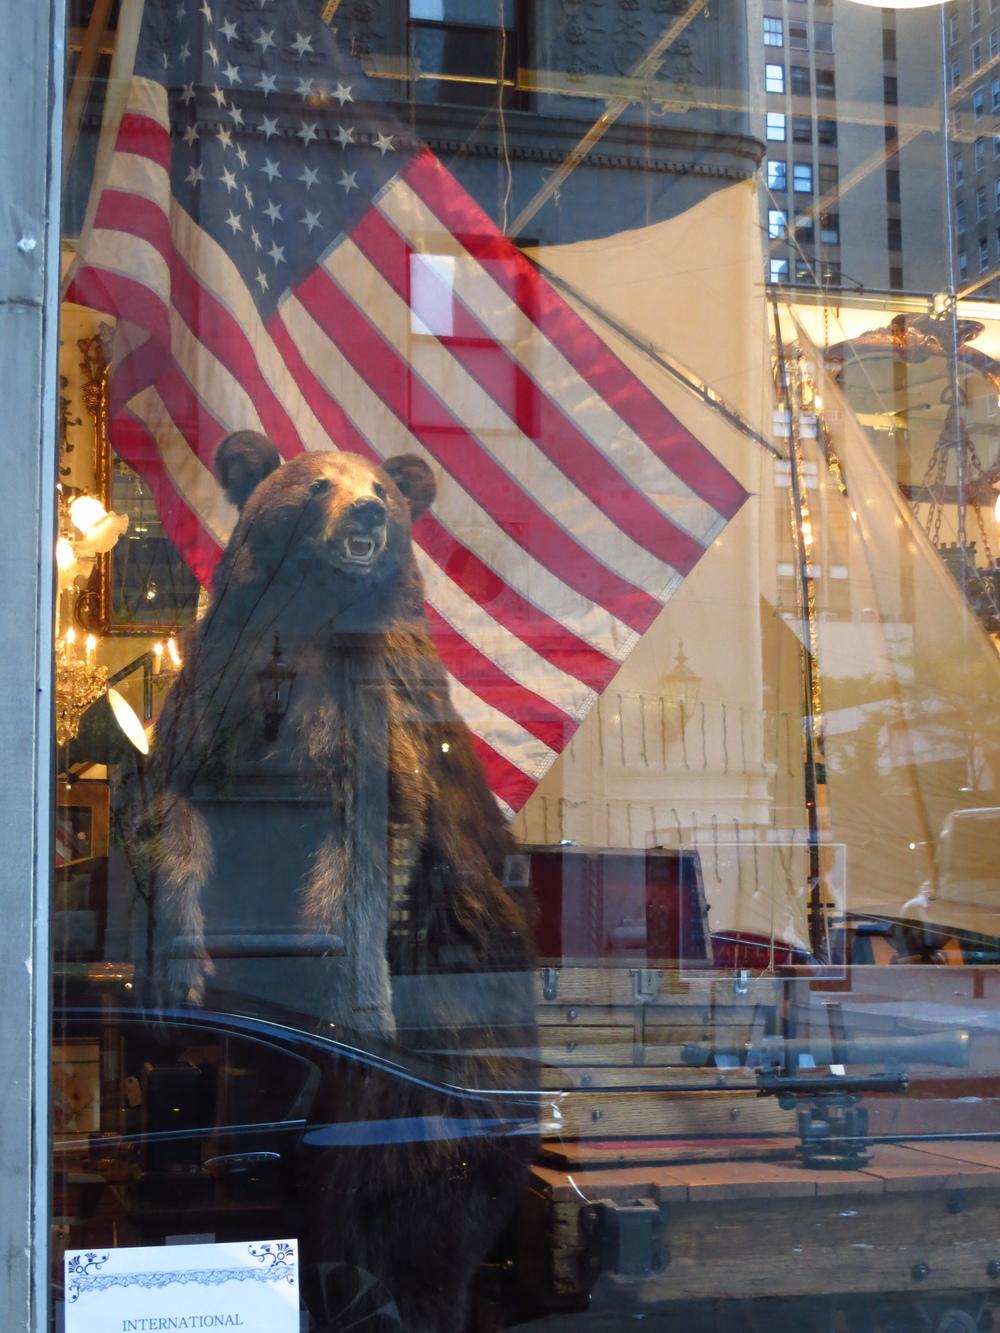 The America Store